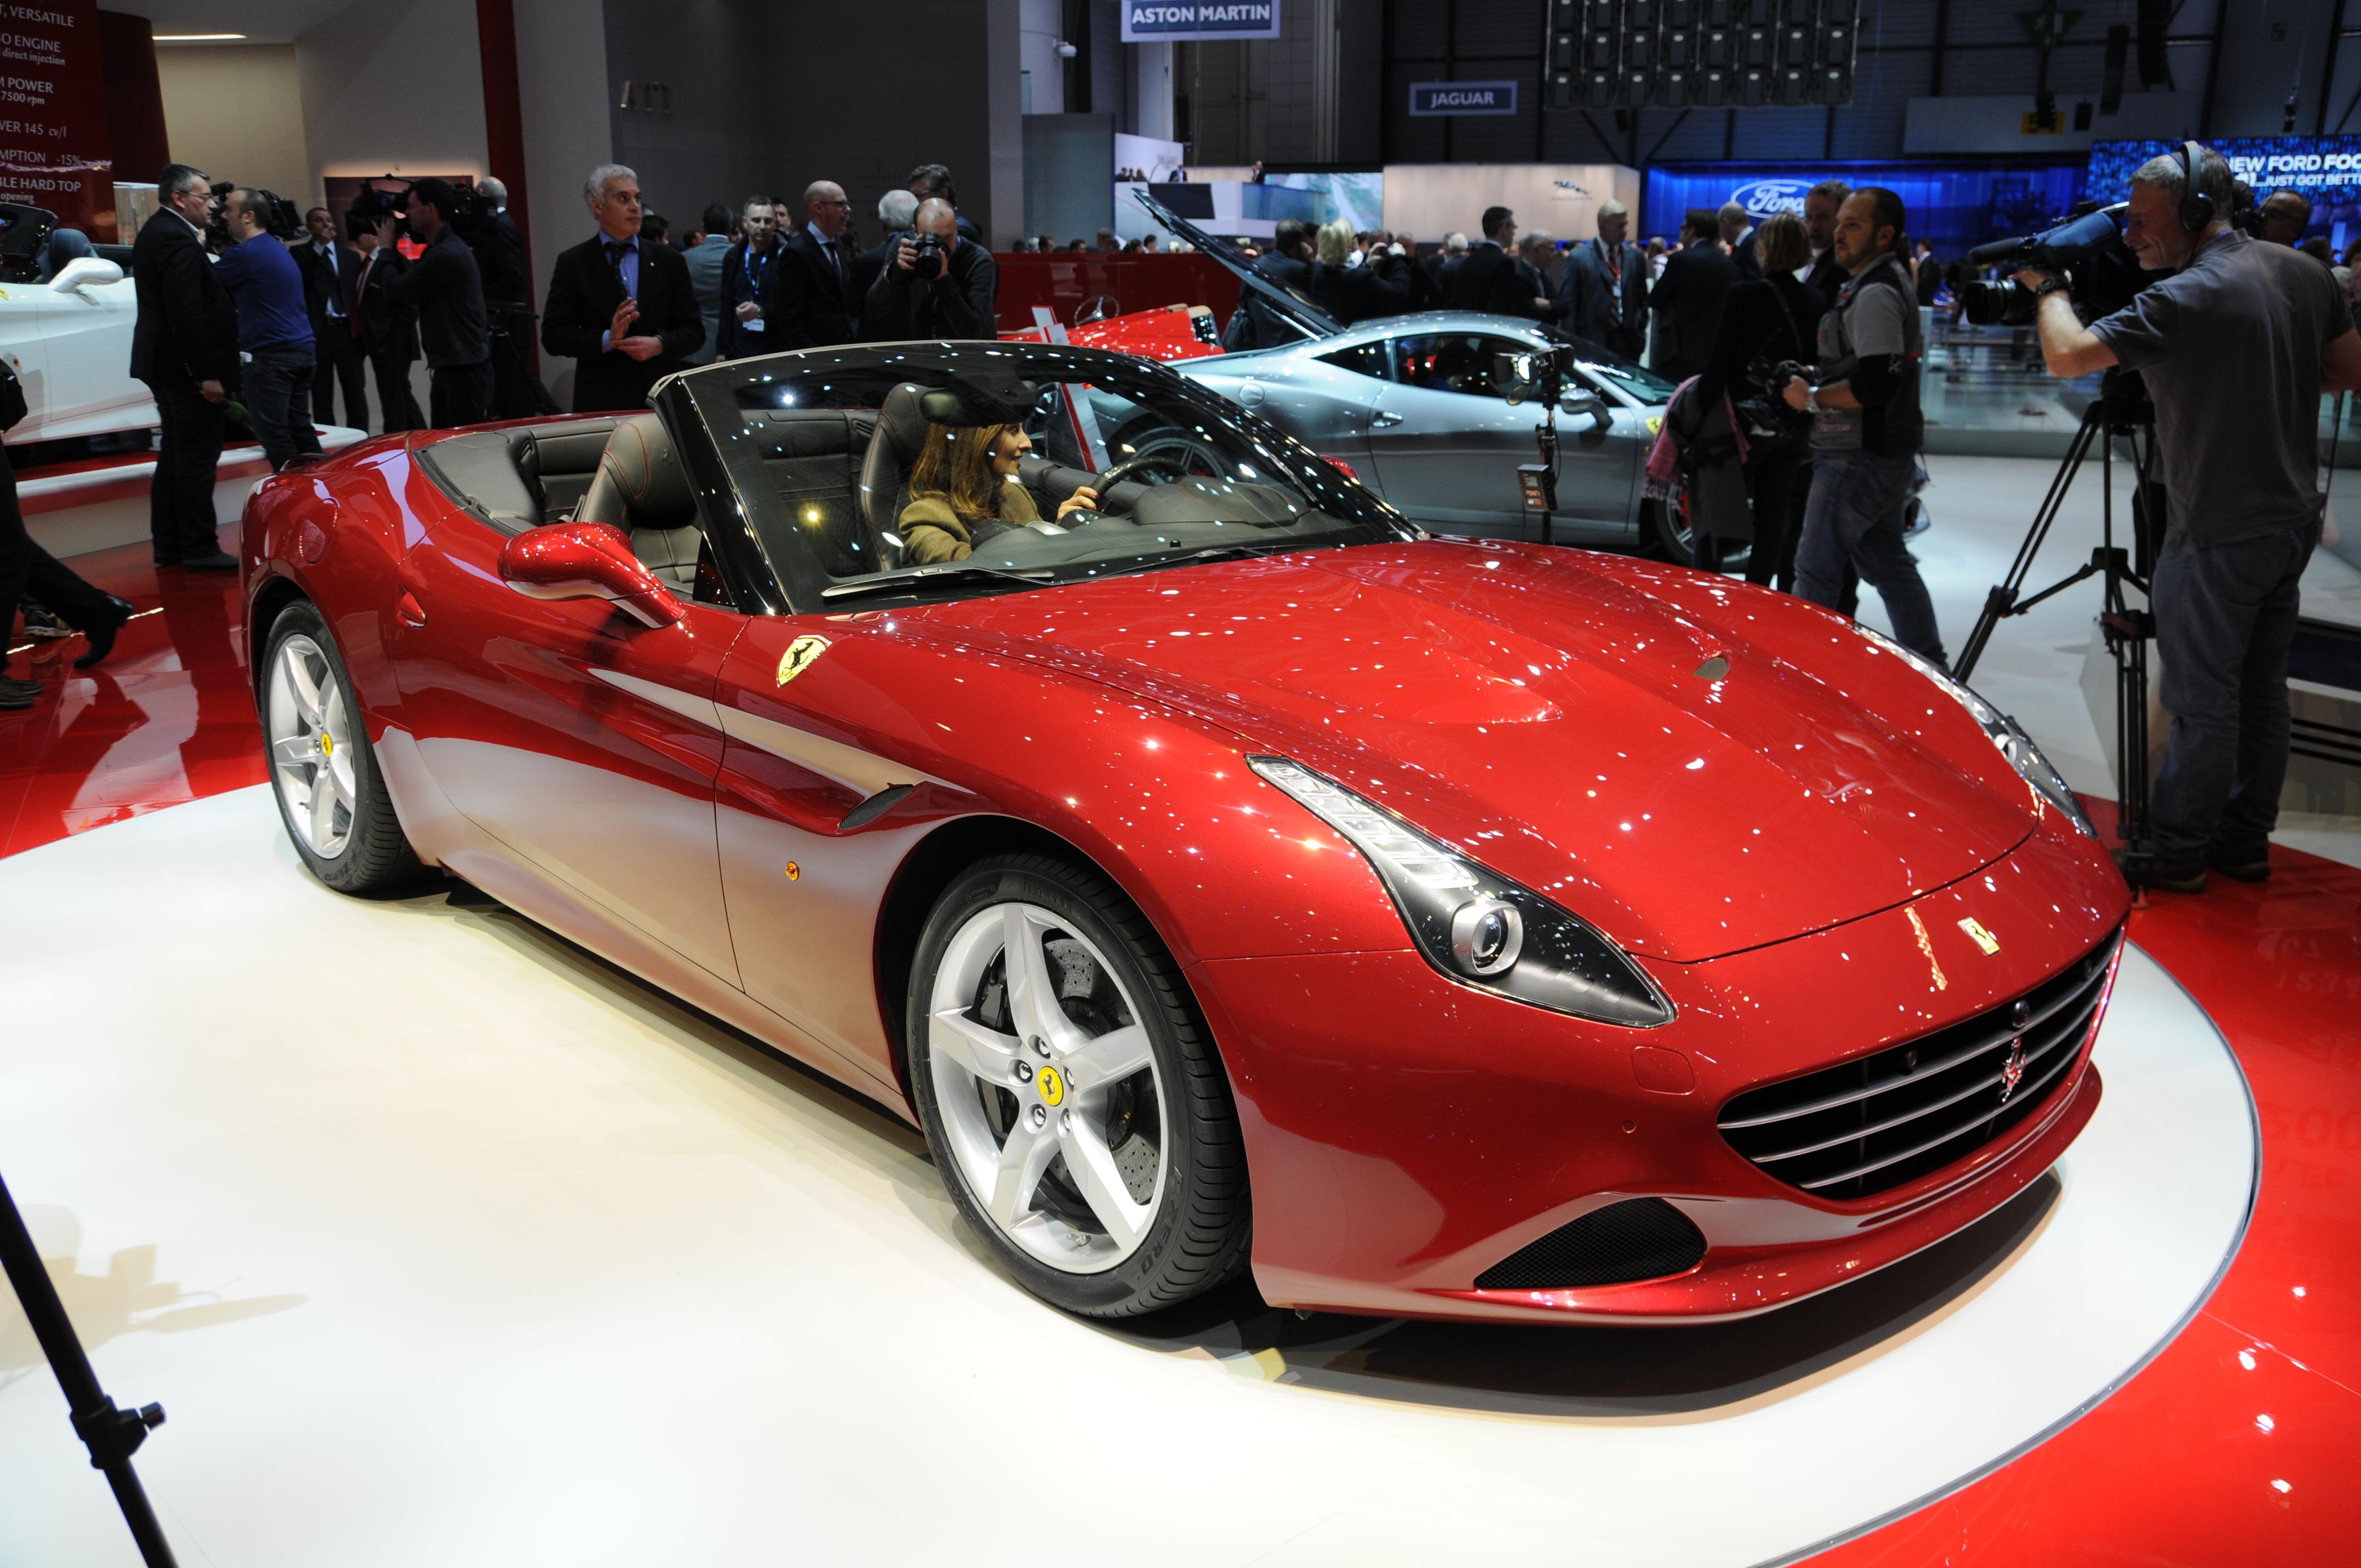 2014-03-04_Geneva_Motor_Show_1454 Fabulous Ferrari Mondial T In Vendita Cars Trend